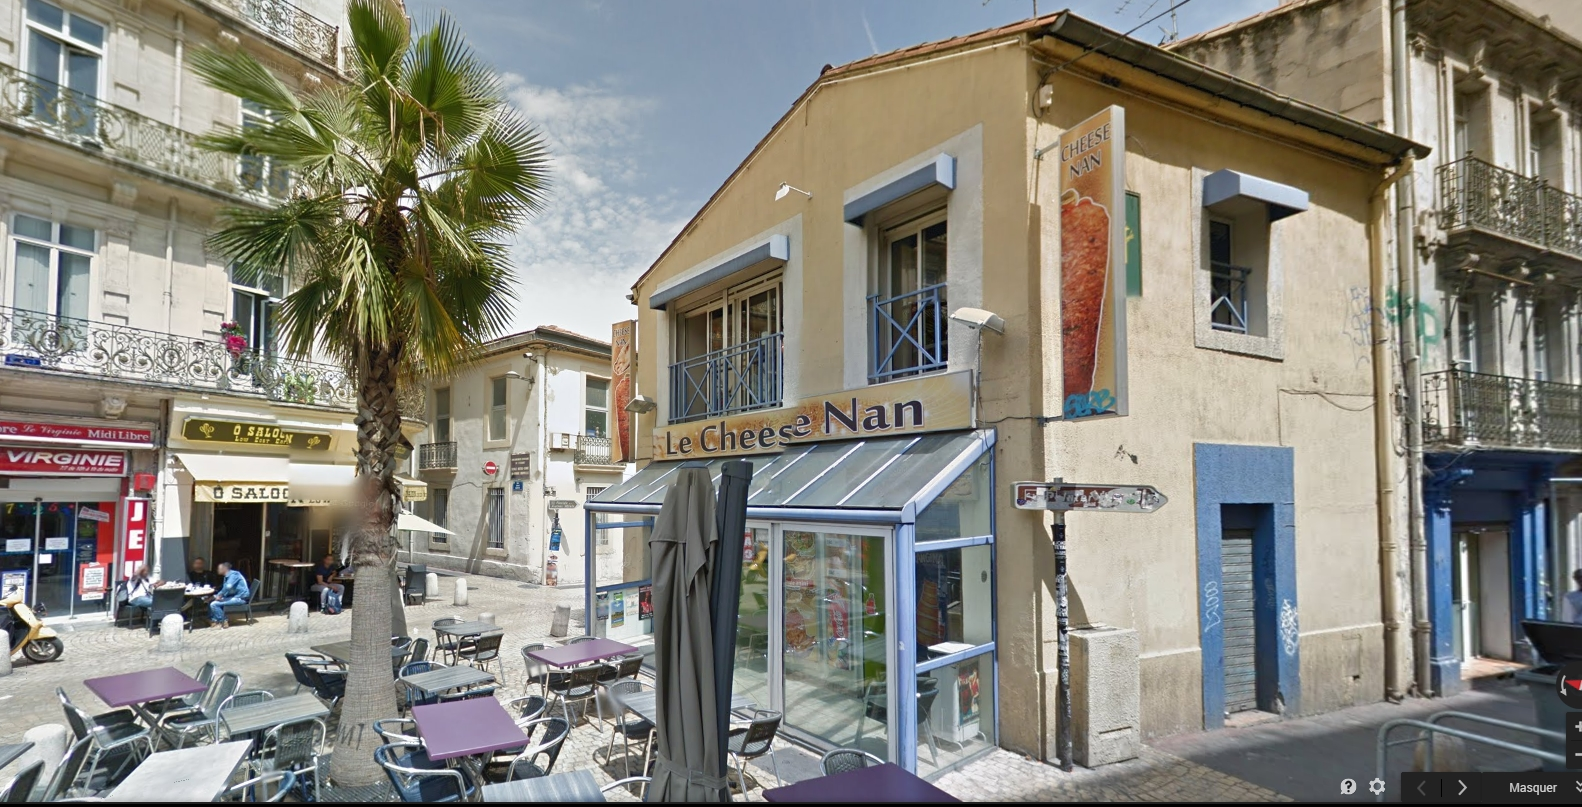 Le Cheese Nan à Montpellier